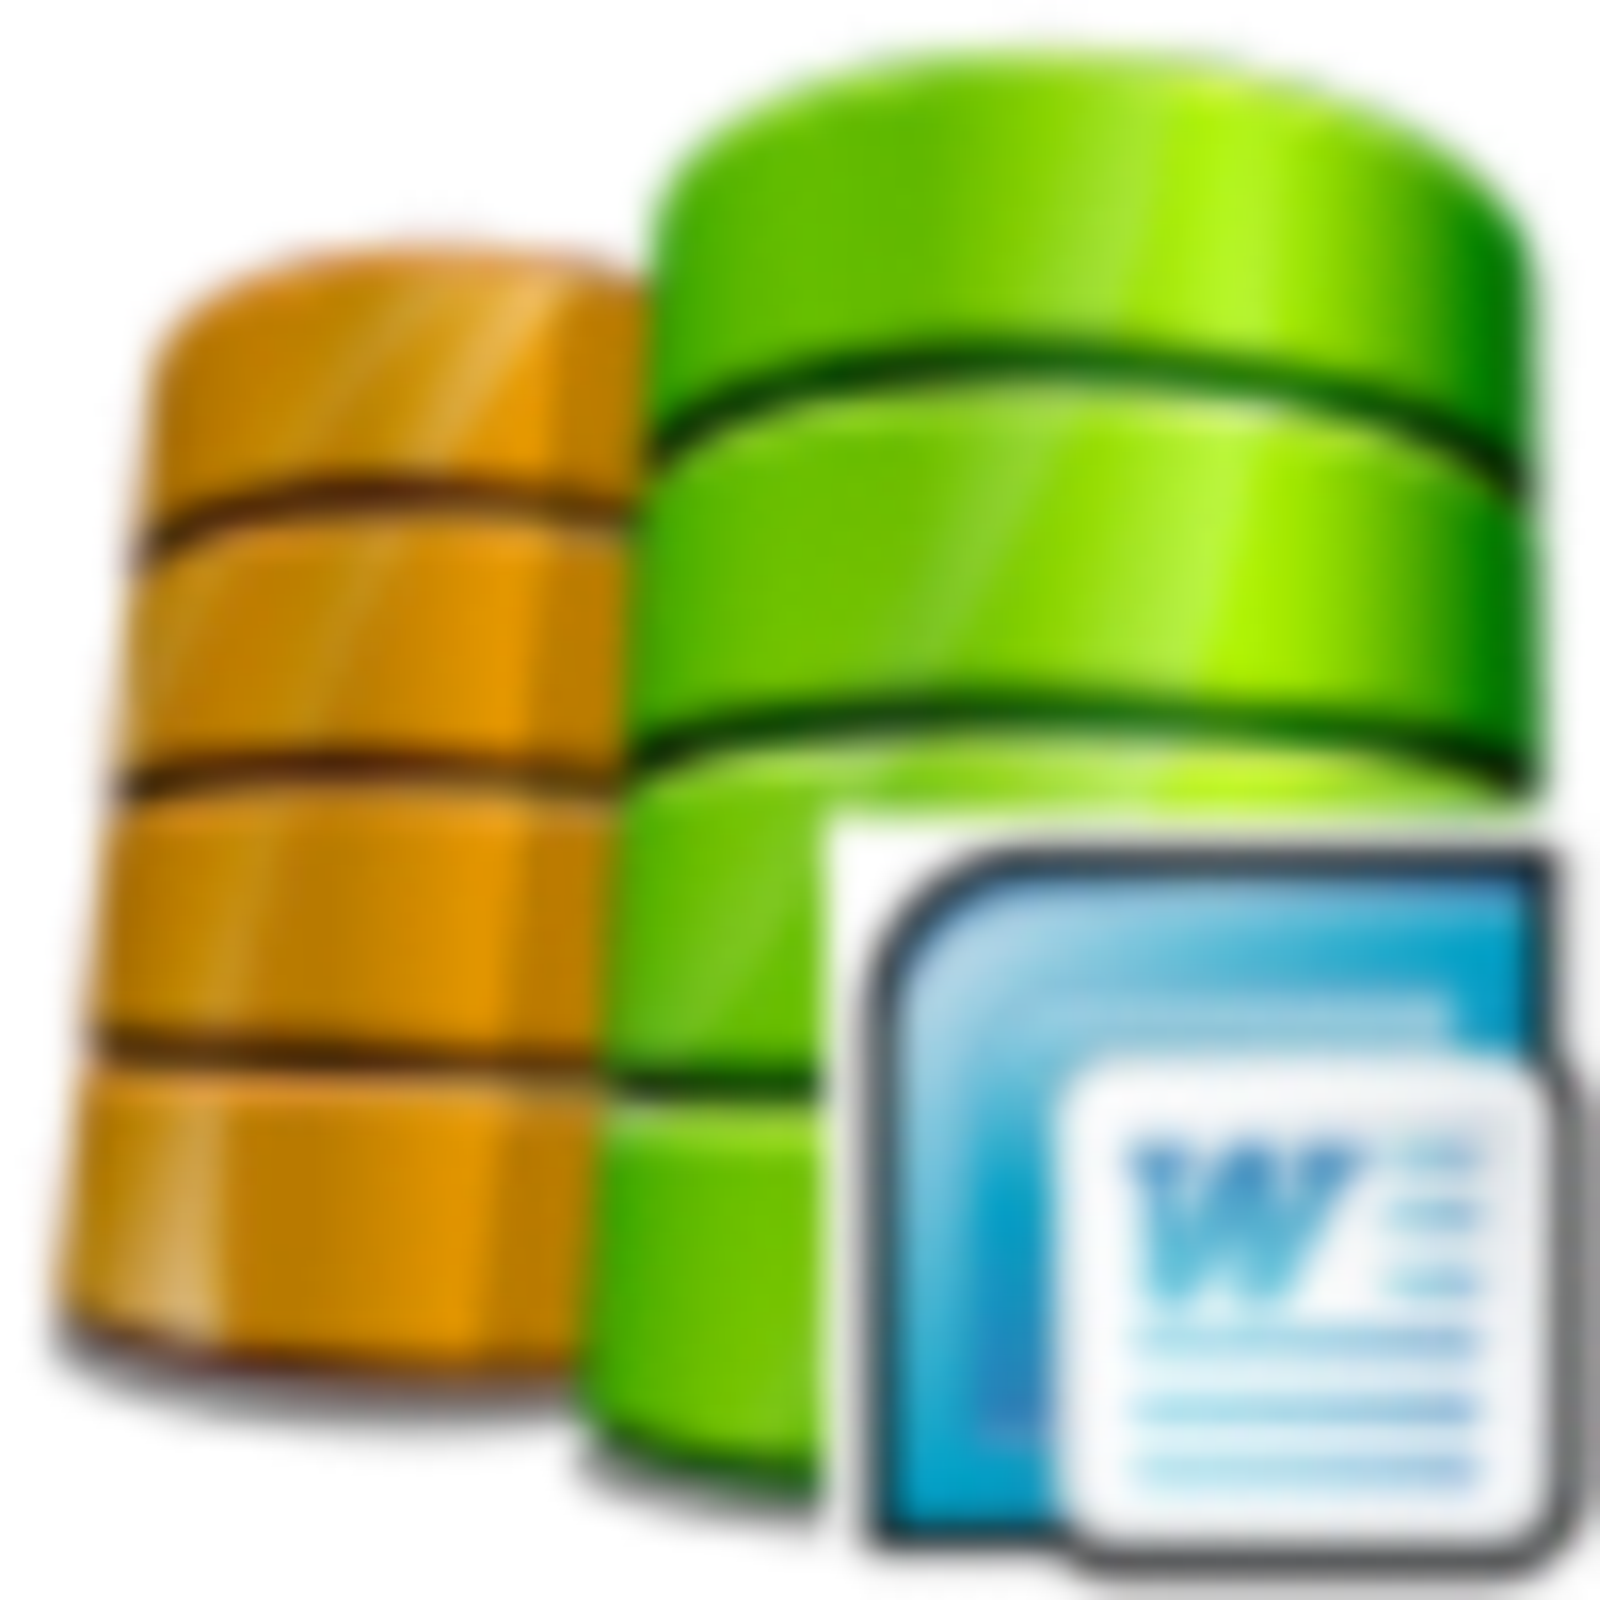 wsSqlSrvDoc 1.0.0.37